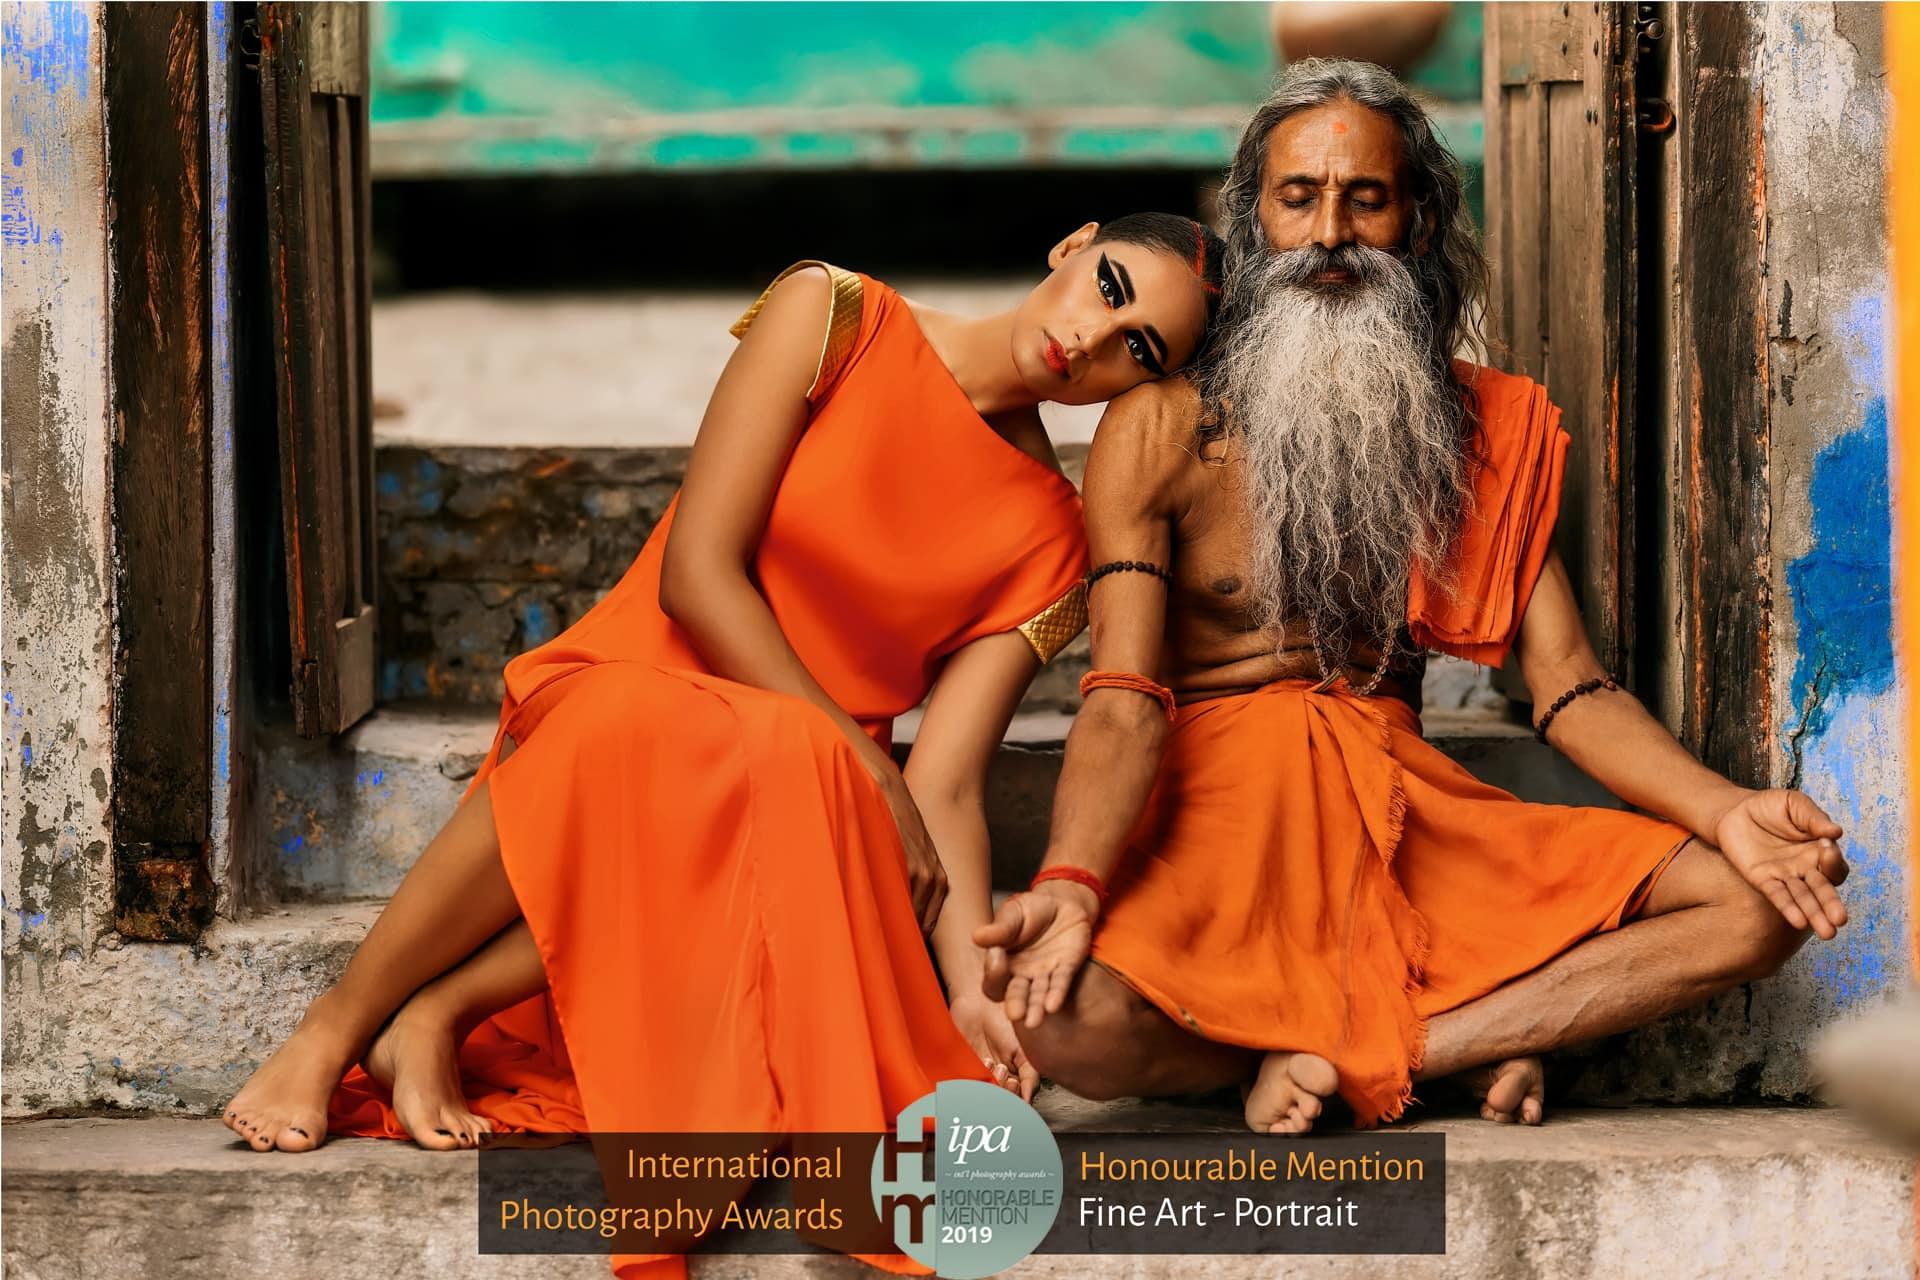 International Photography Awards Winner Arjun Kamath